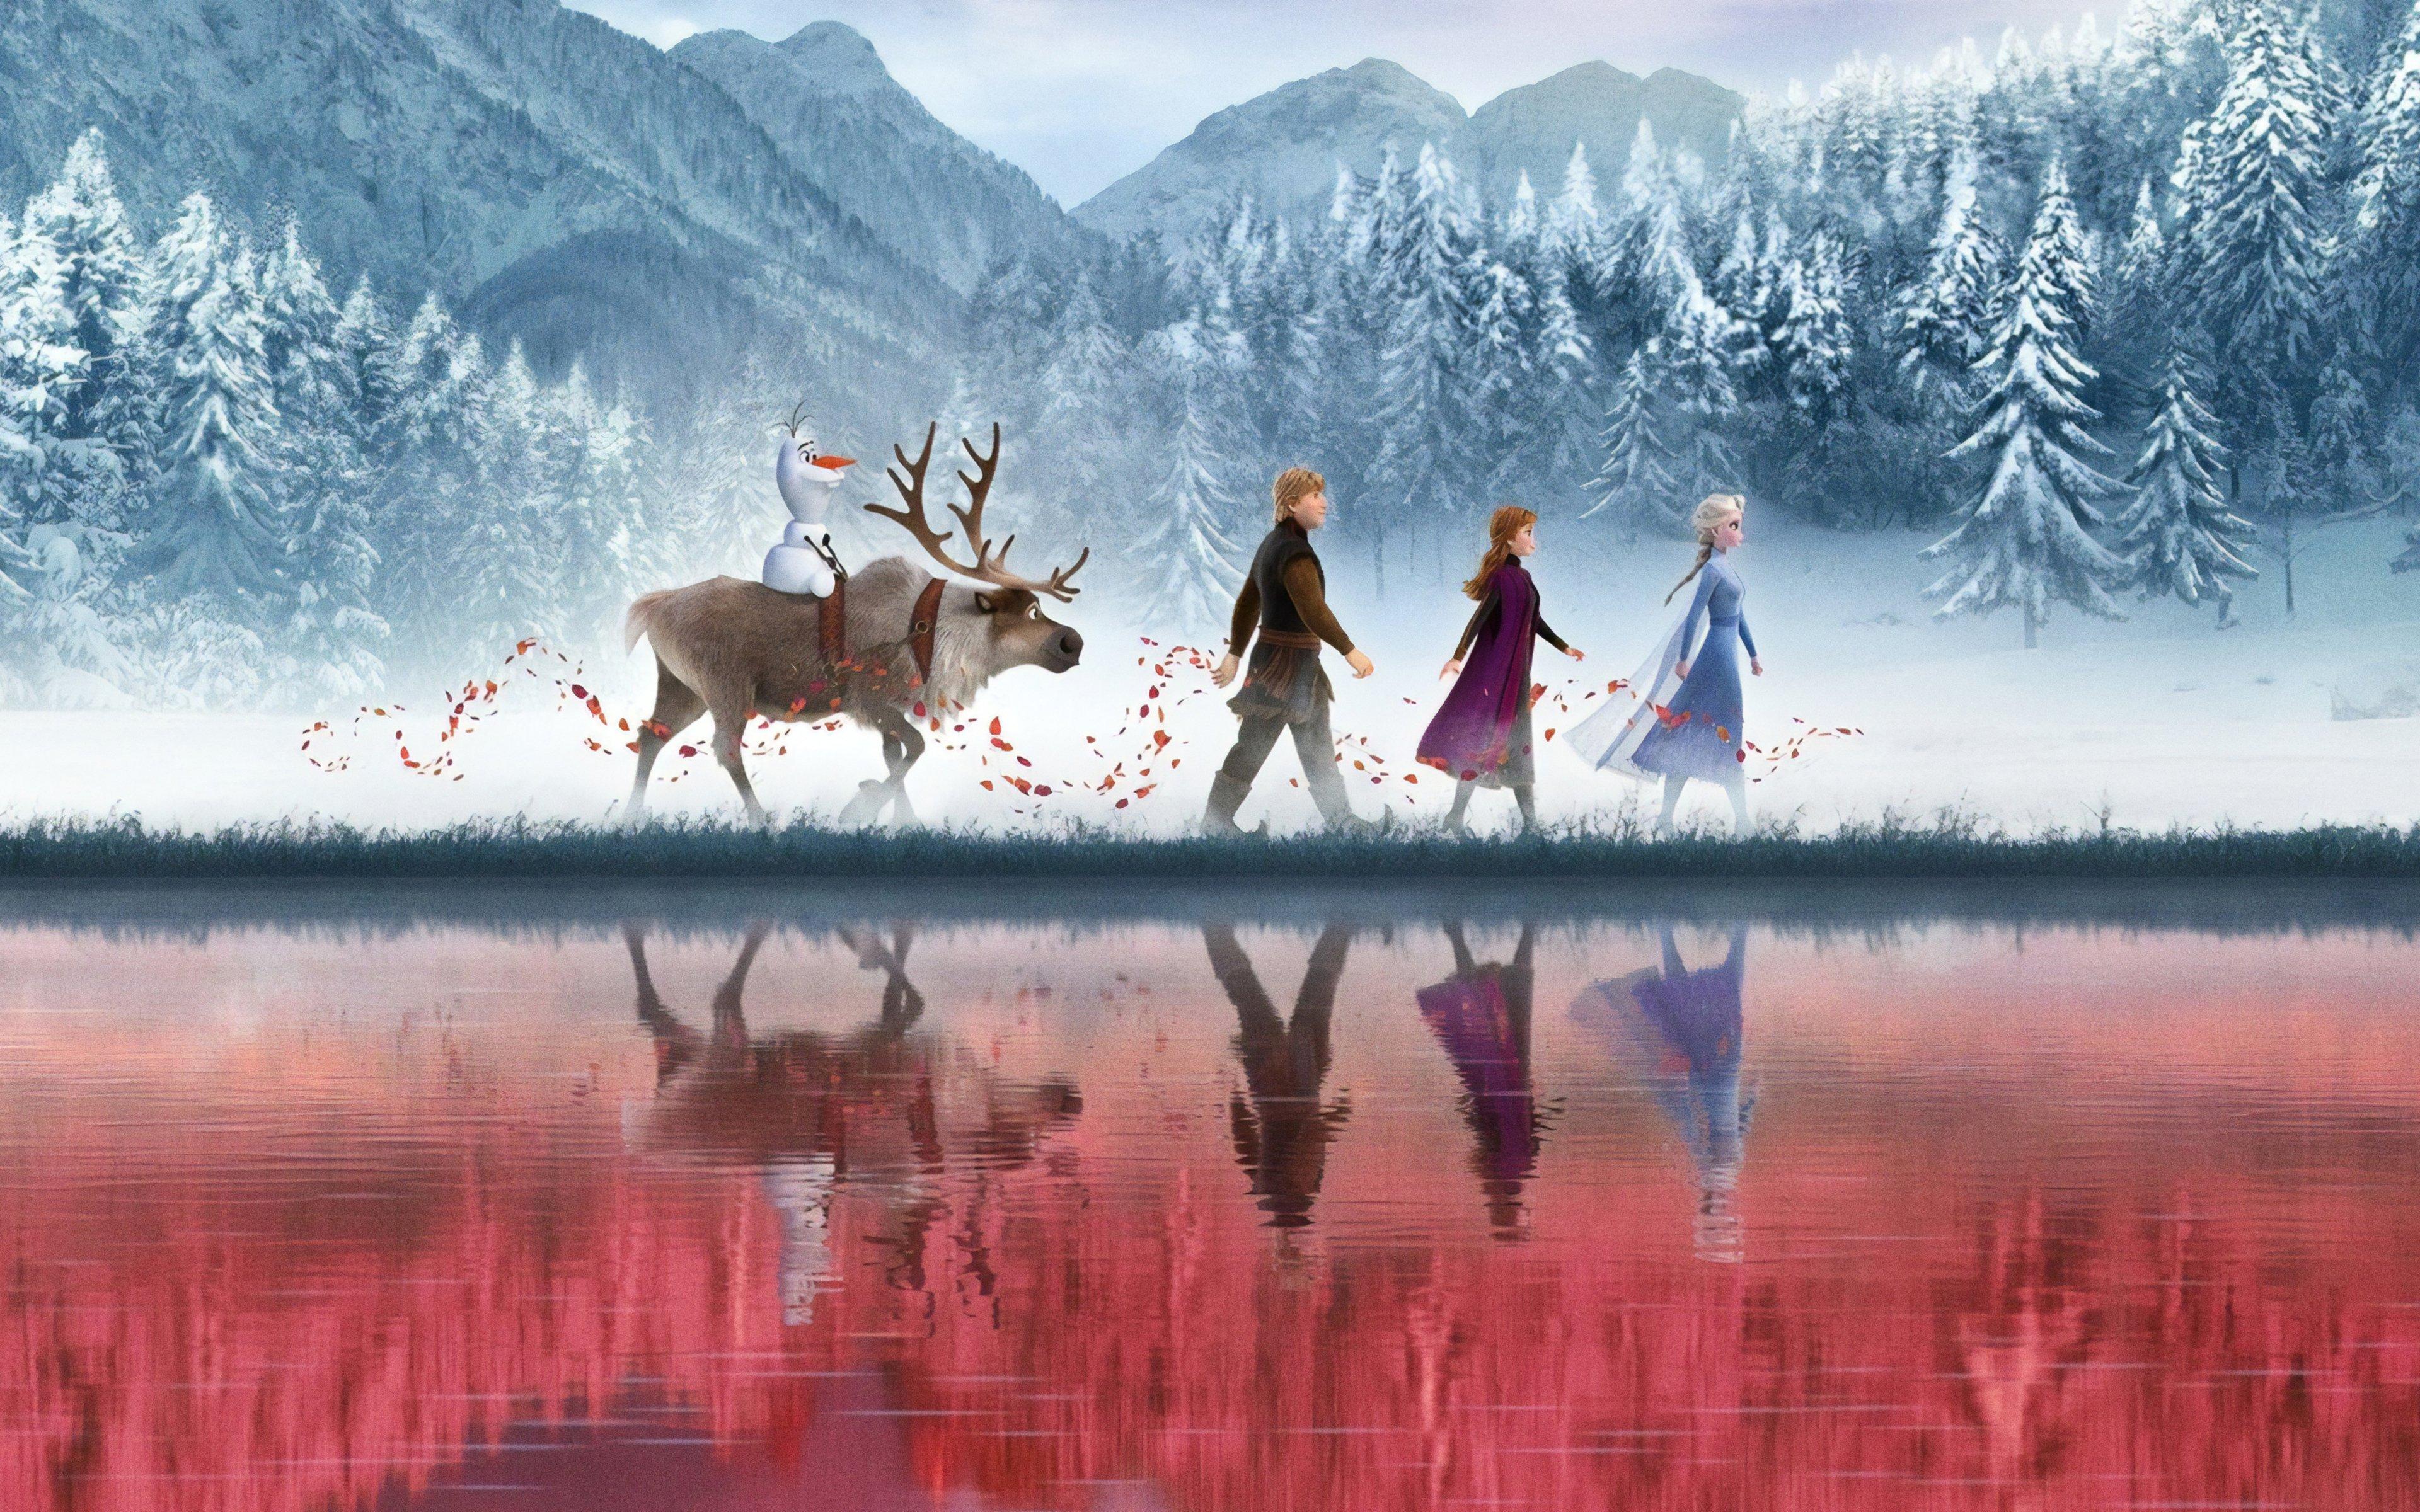 Wallpaper Characters from Frozen walking